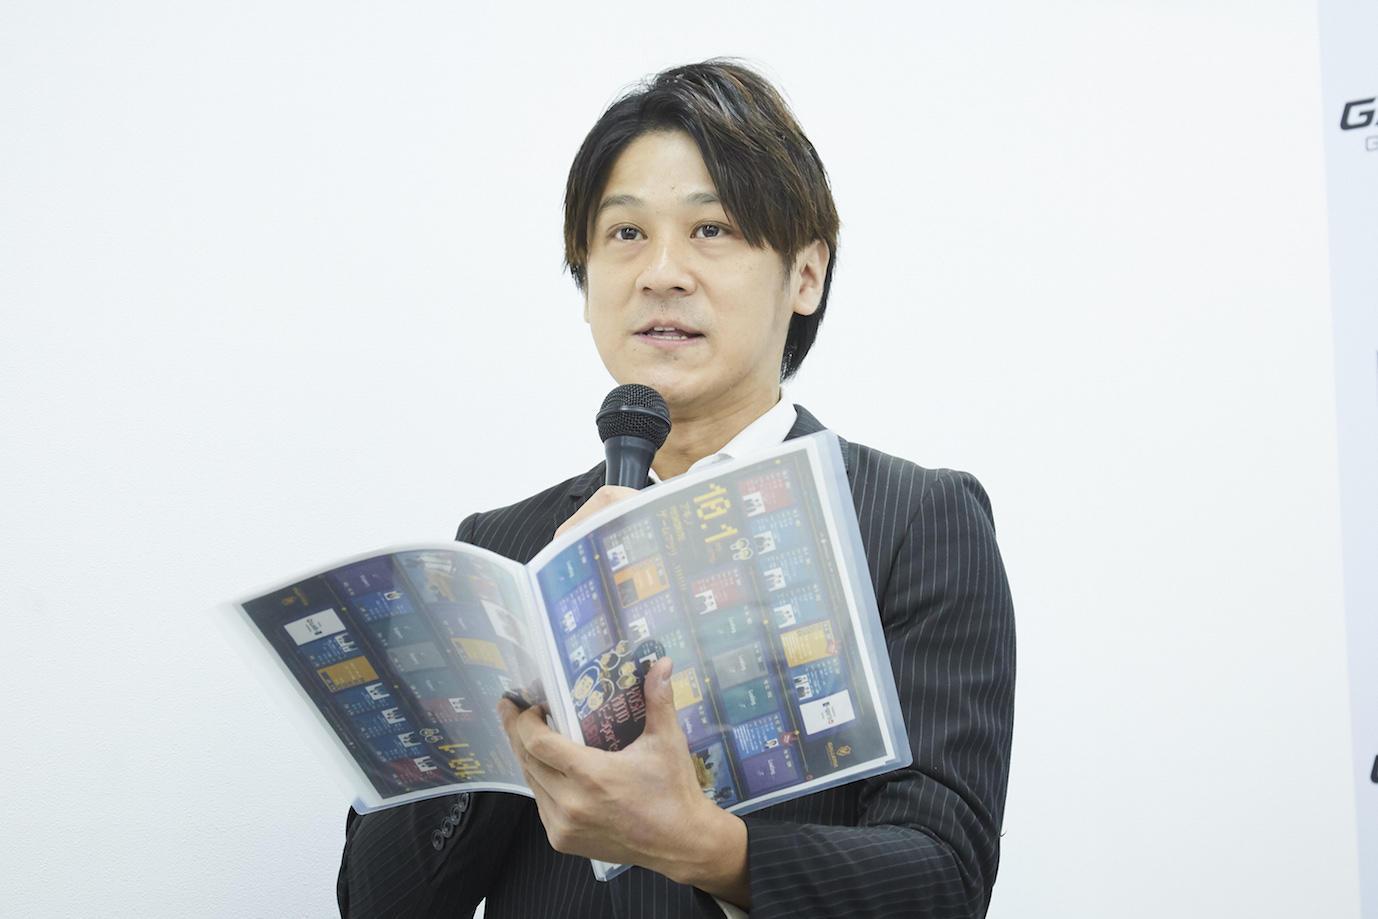 http://news.yoshimoto.co.jp/20180913000739-c5a995c4ee3cac71721b3c1d0f32e85d808ab242.jpg